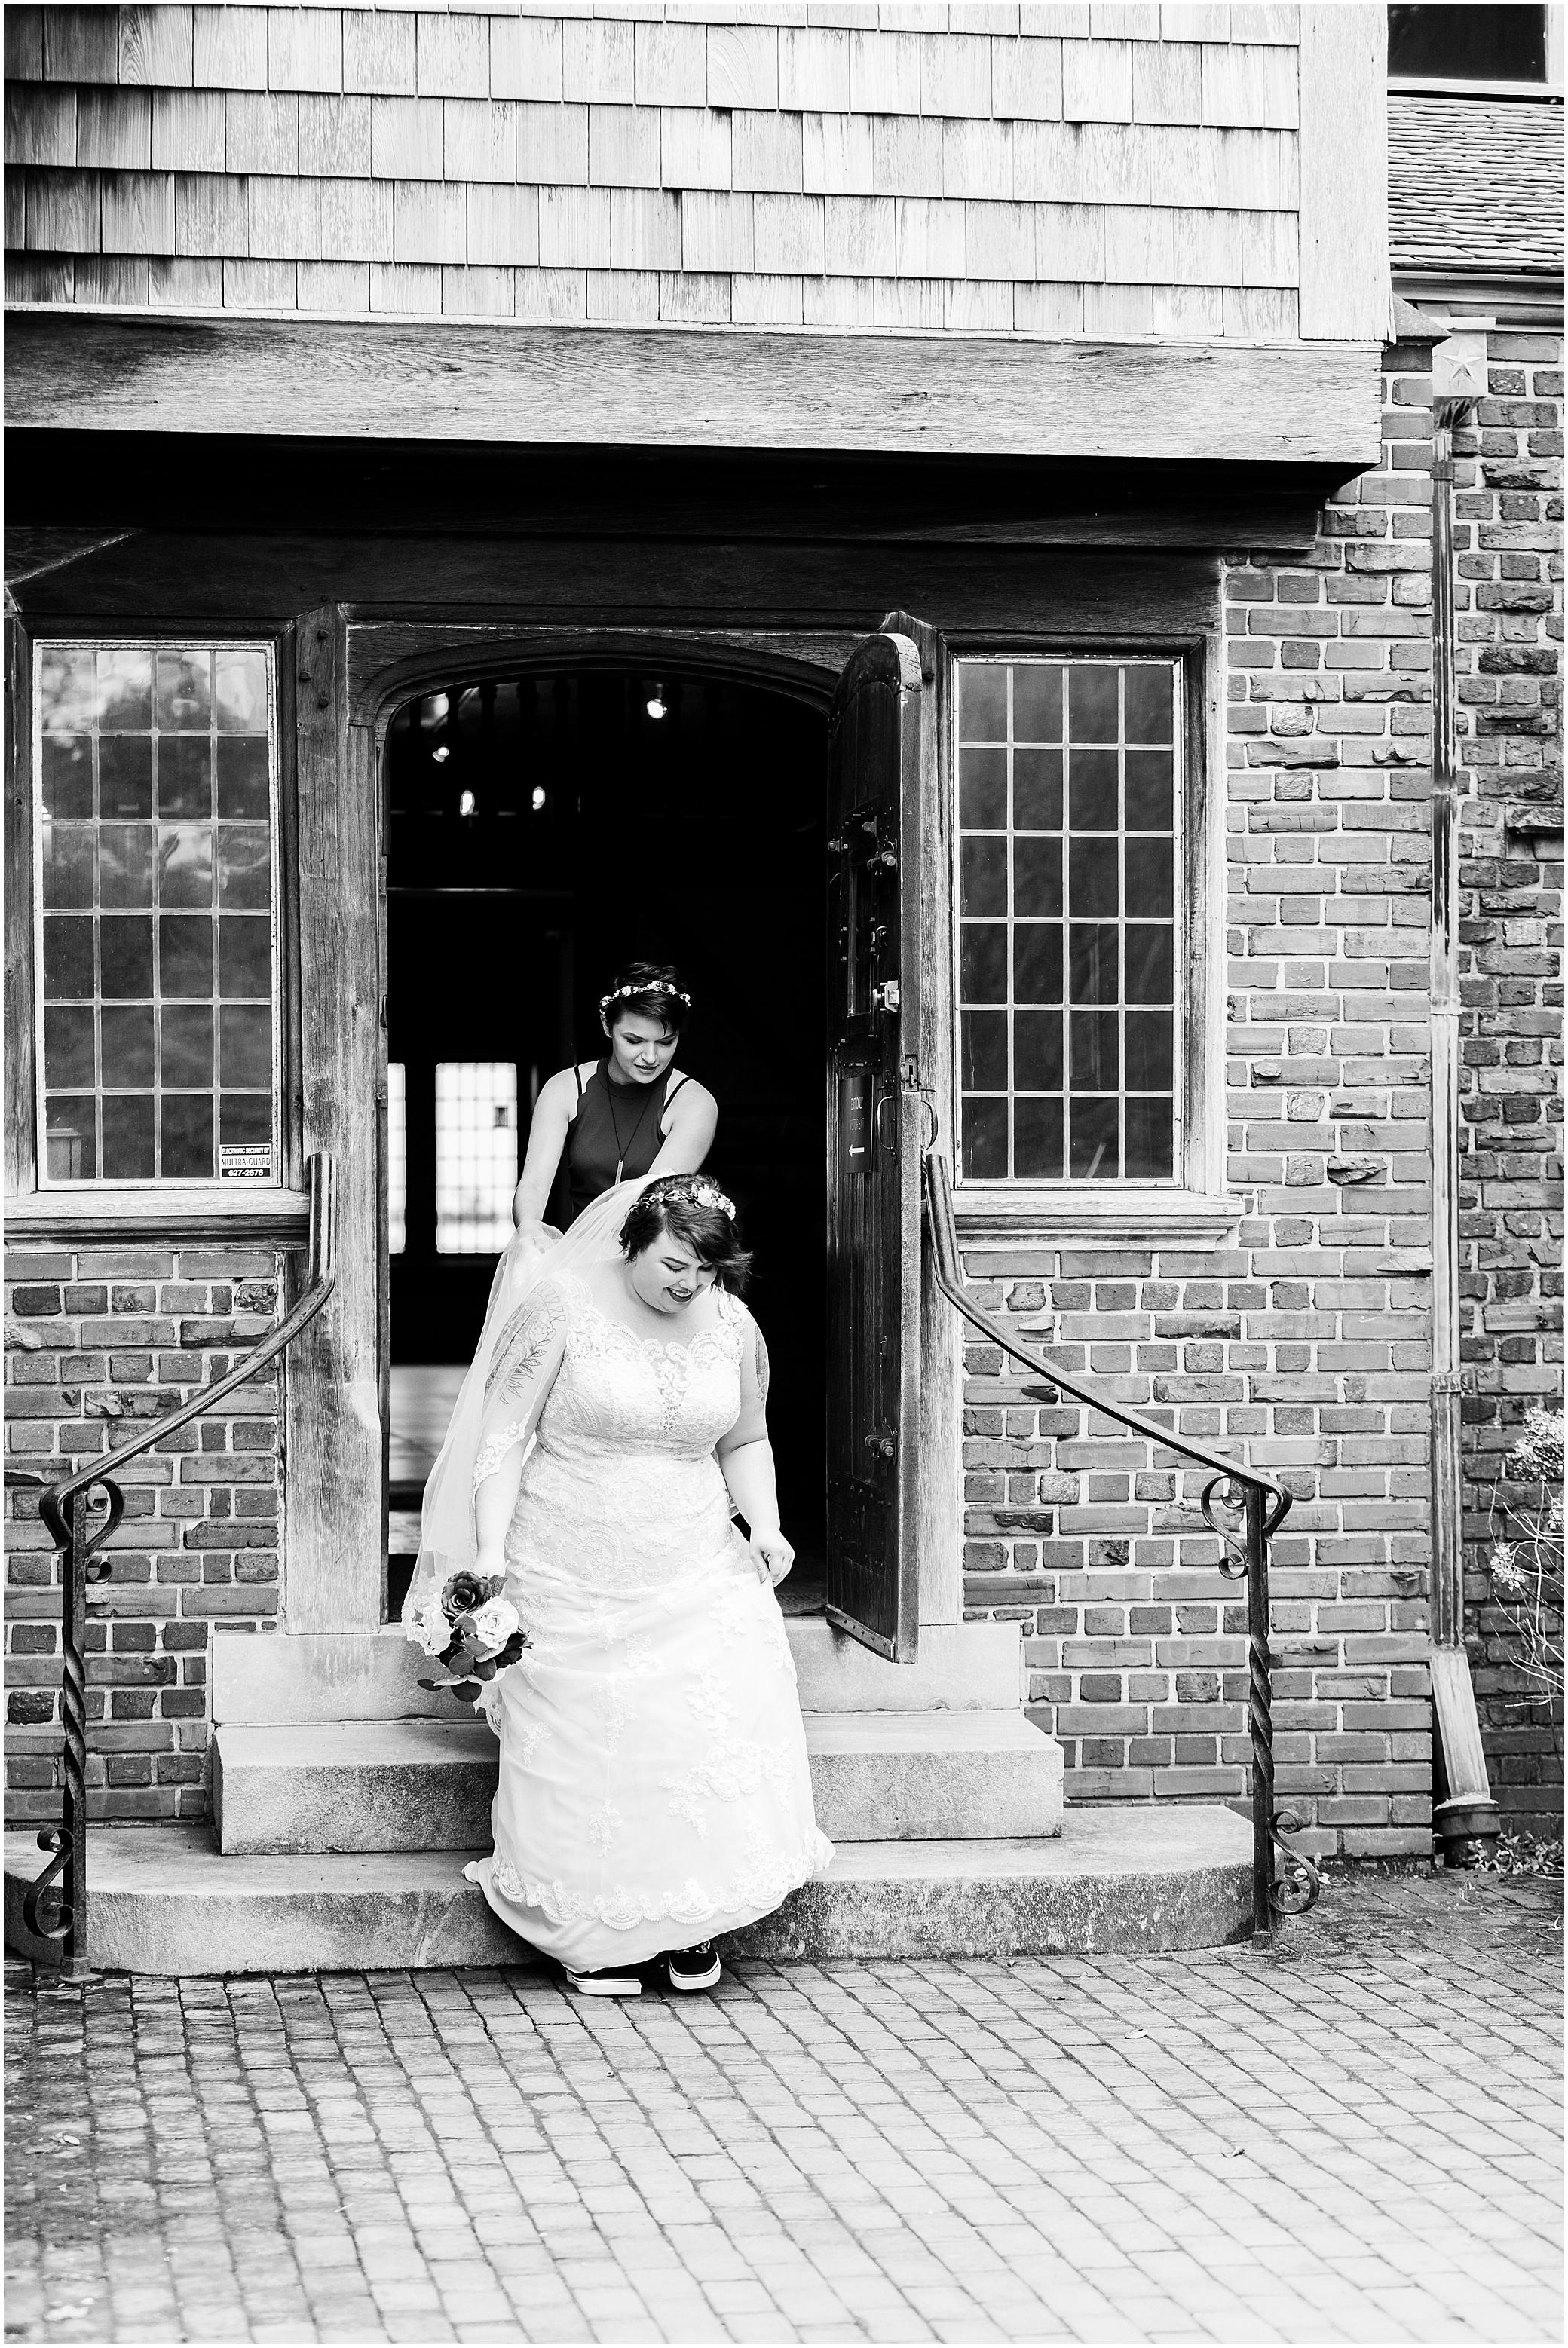 hermitage museum and gardens elopement, studio i do wedding dress, intimate wedding ceremony at the hermitage museum and gardens